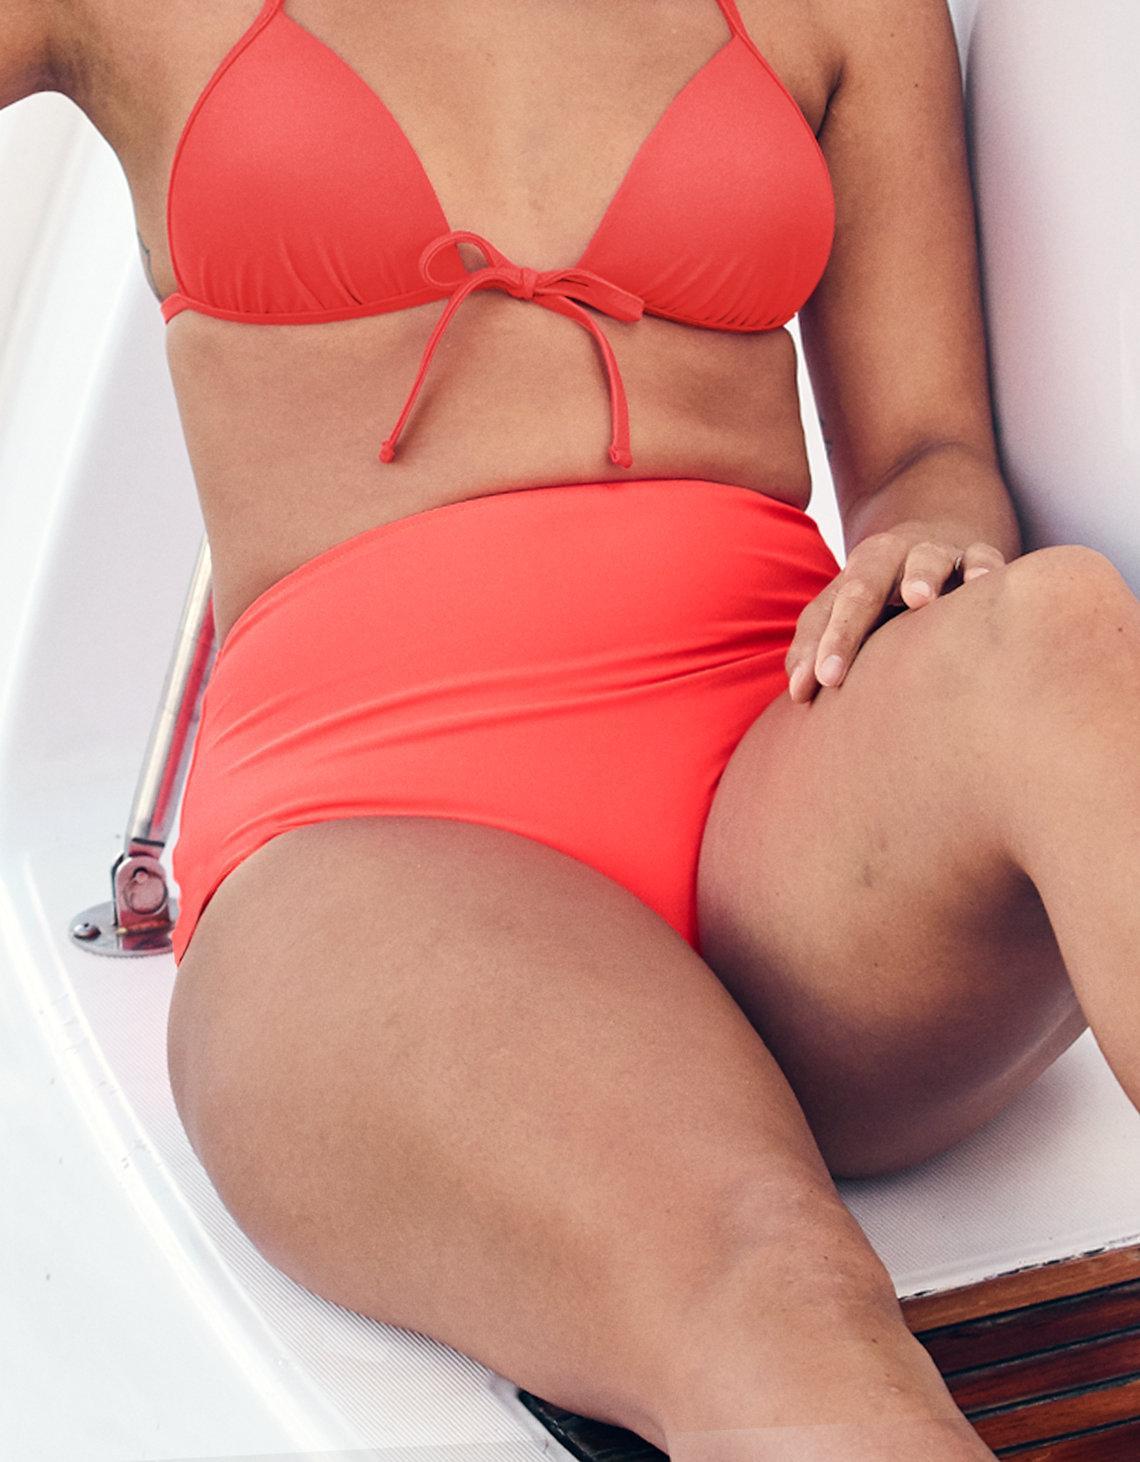 0d4b4b058b3f8 Lyst - American Eagle High Waisted Bikini Bottom in Red - Save 29%